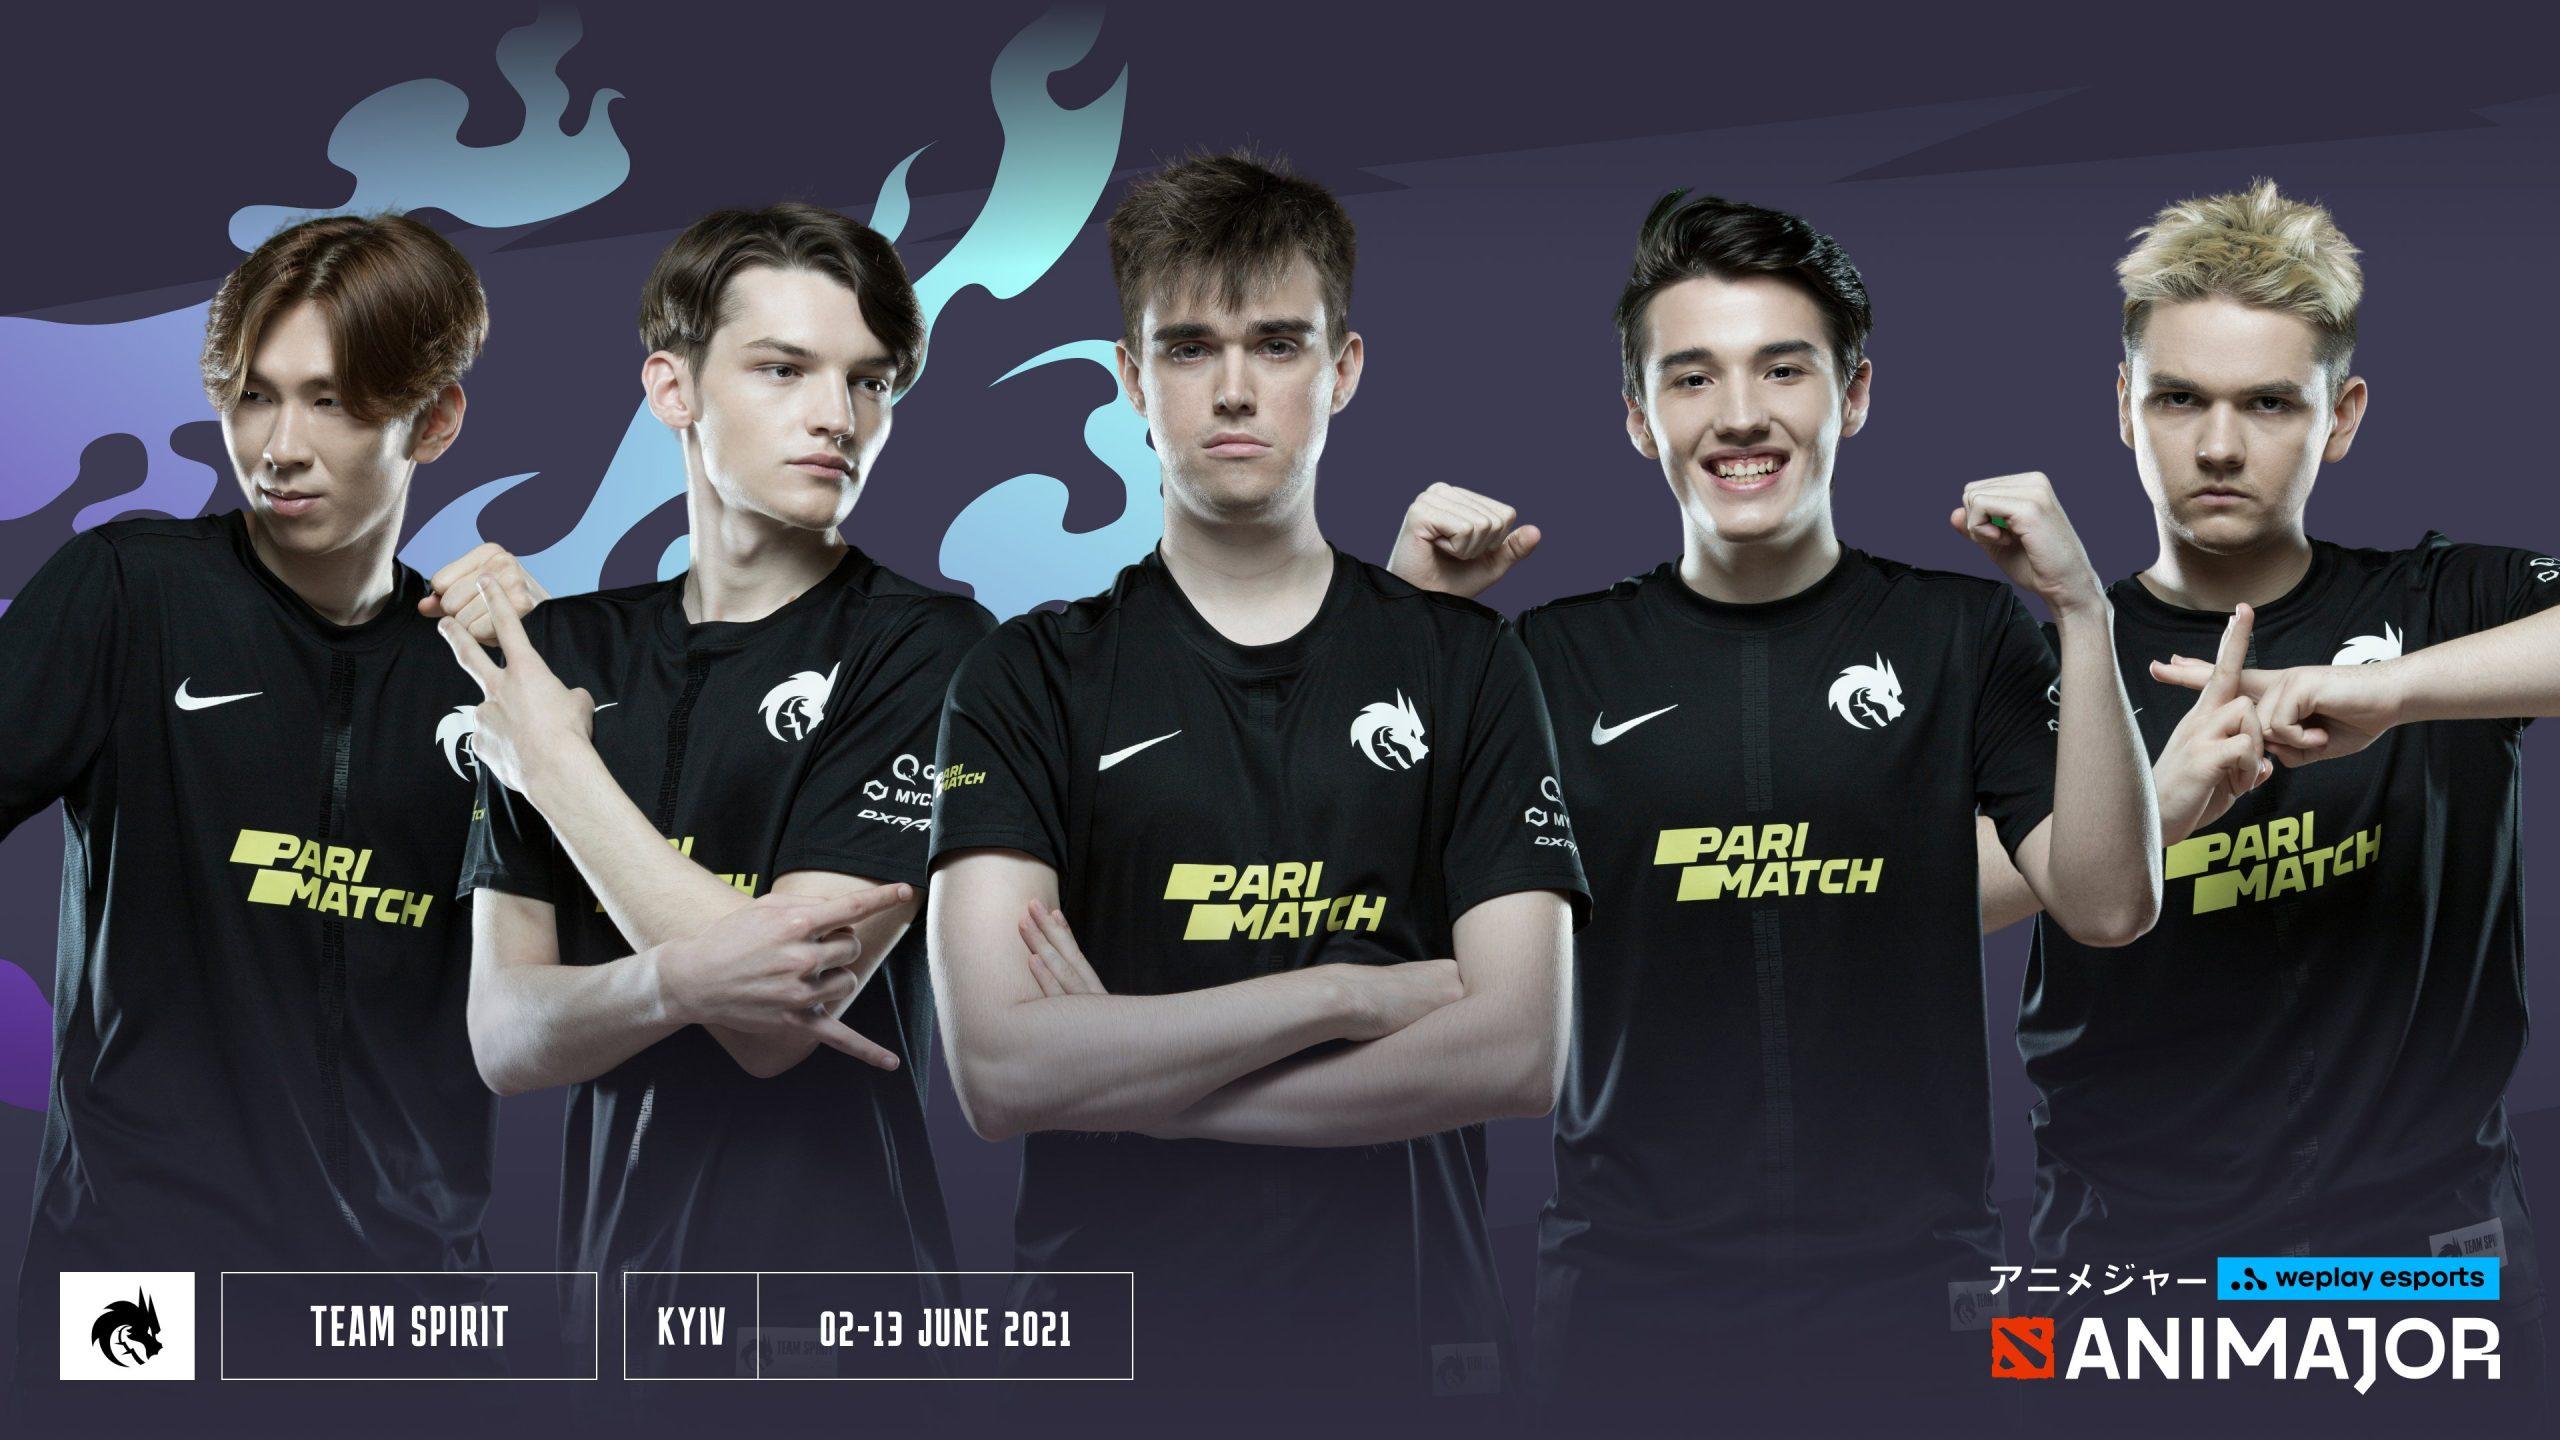 animajor-team-spirit1